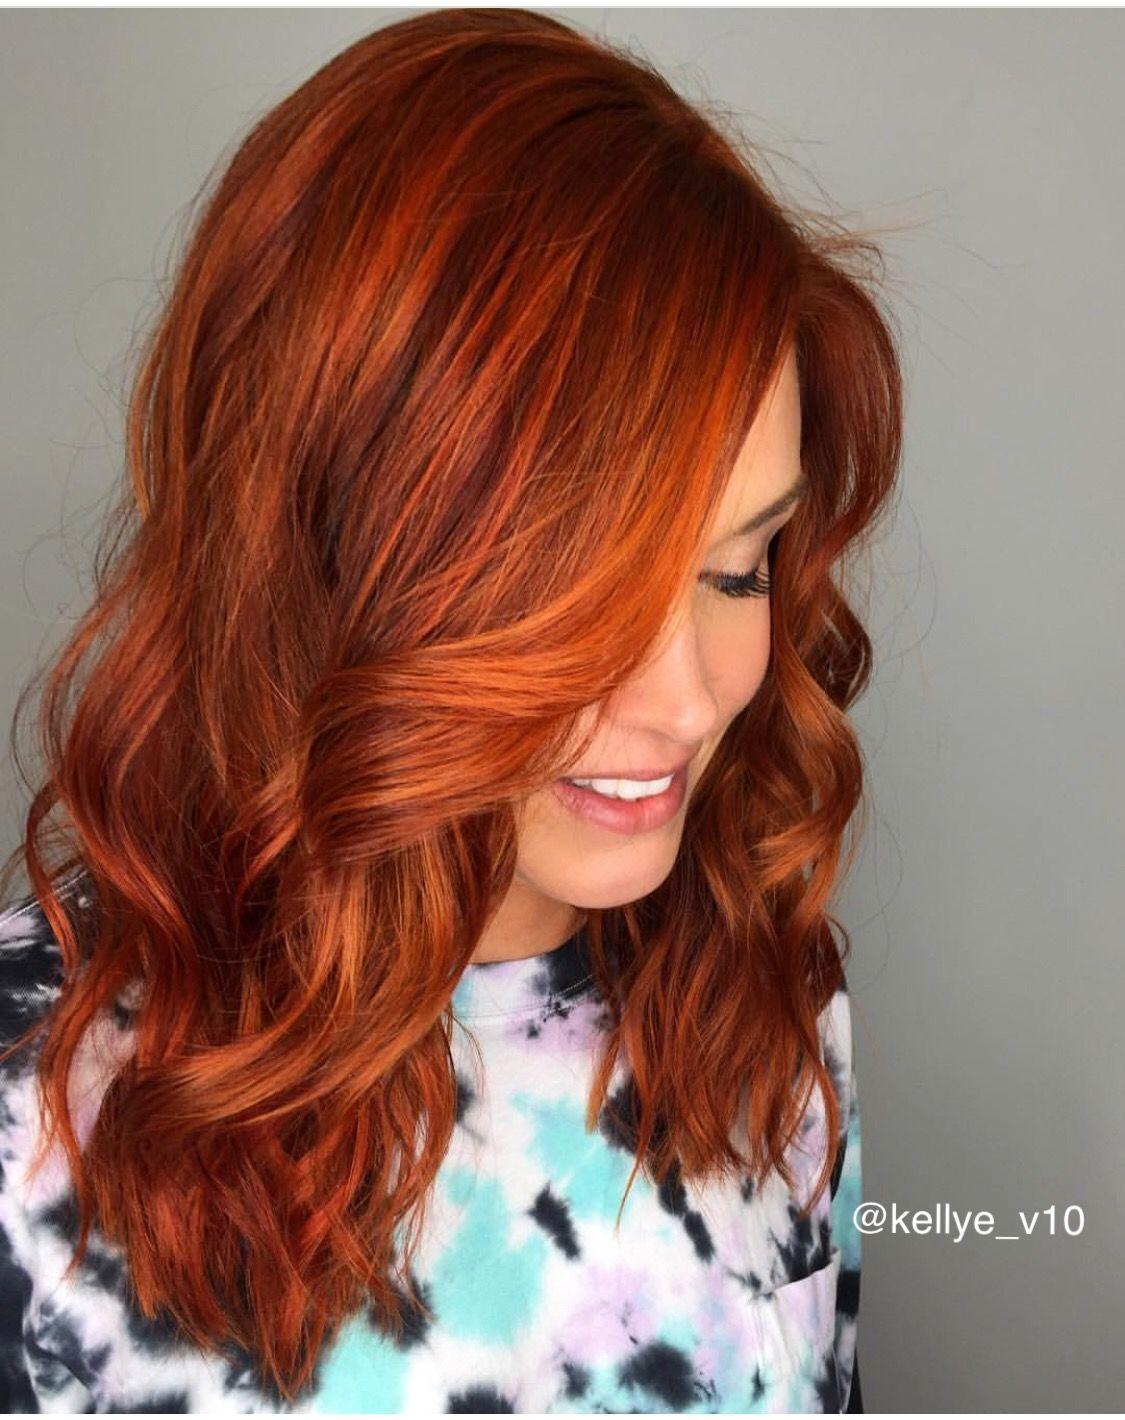 Red Hair Copper Hair Joico Olaplex Vivid Love My Bright Copper Vividhaircolors Redhead Beachwaves Ginger Kellye V1 Copper Hair Color Balayage Hair Copper Hair